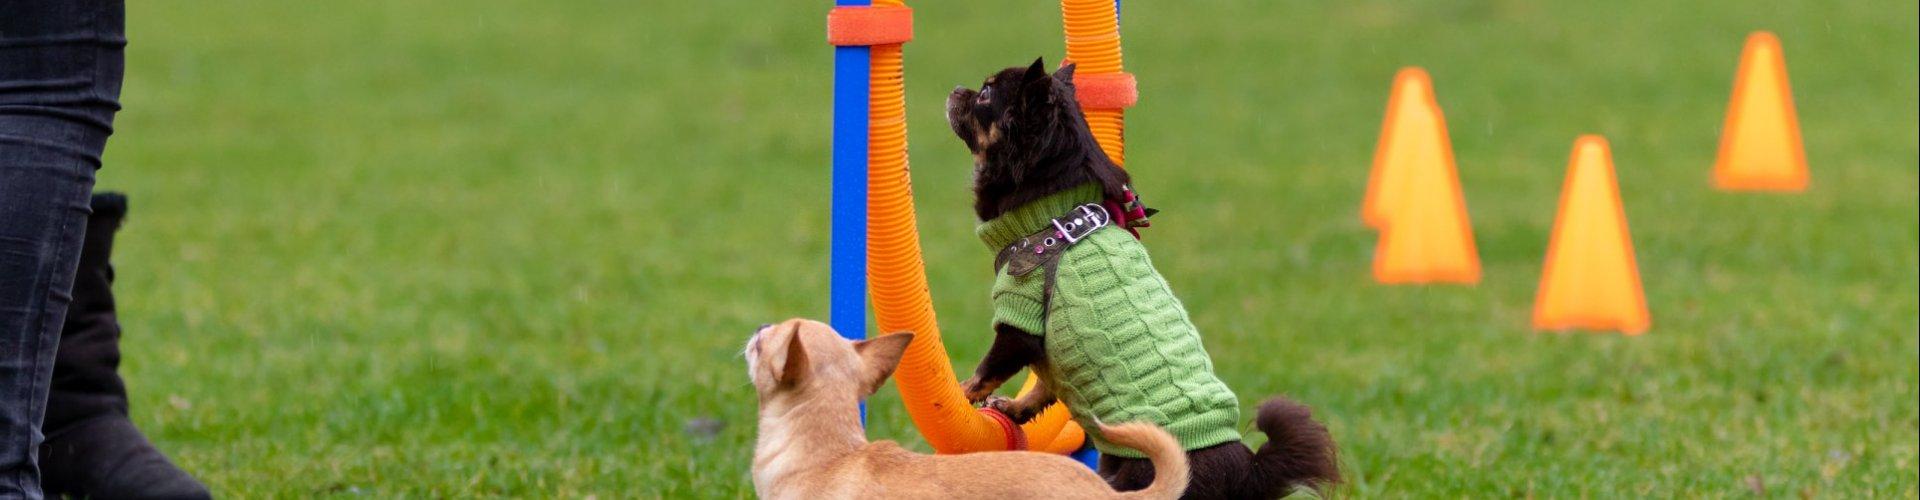 Chihuahua playday Vlaardingen header